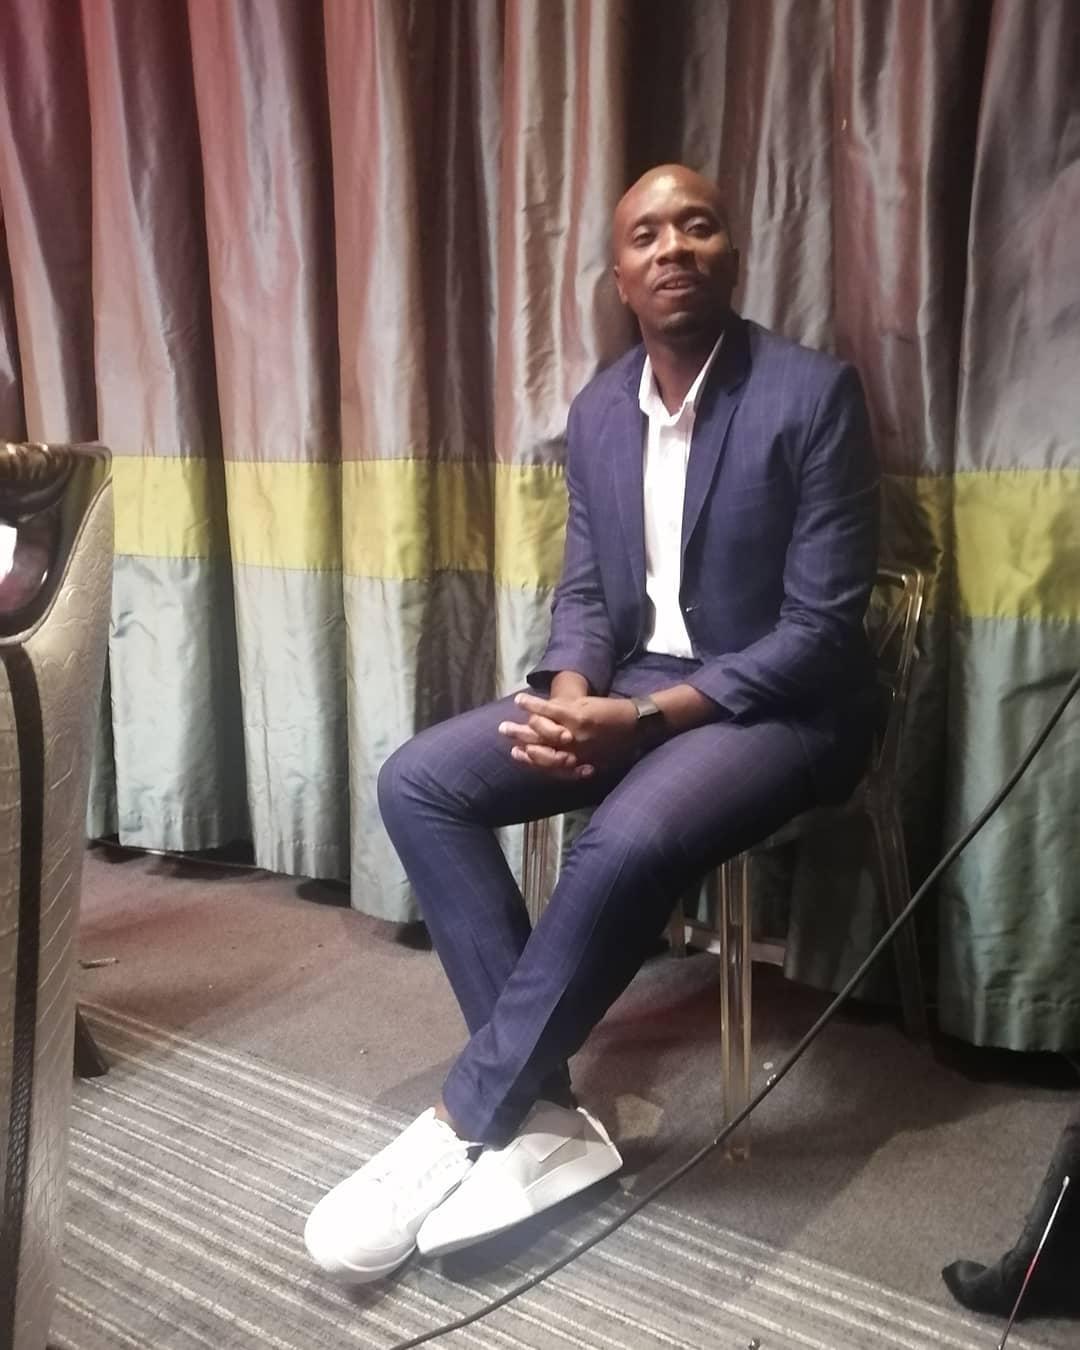 Uzalo actor Cebolenkosi Mthembu applies for a protection order against his Durban Gen actress ex-lover